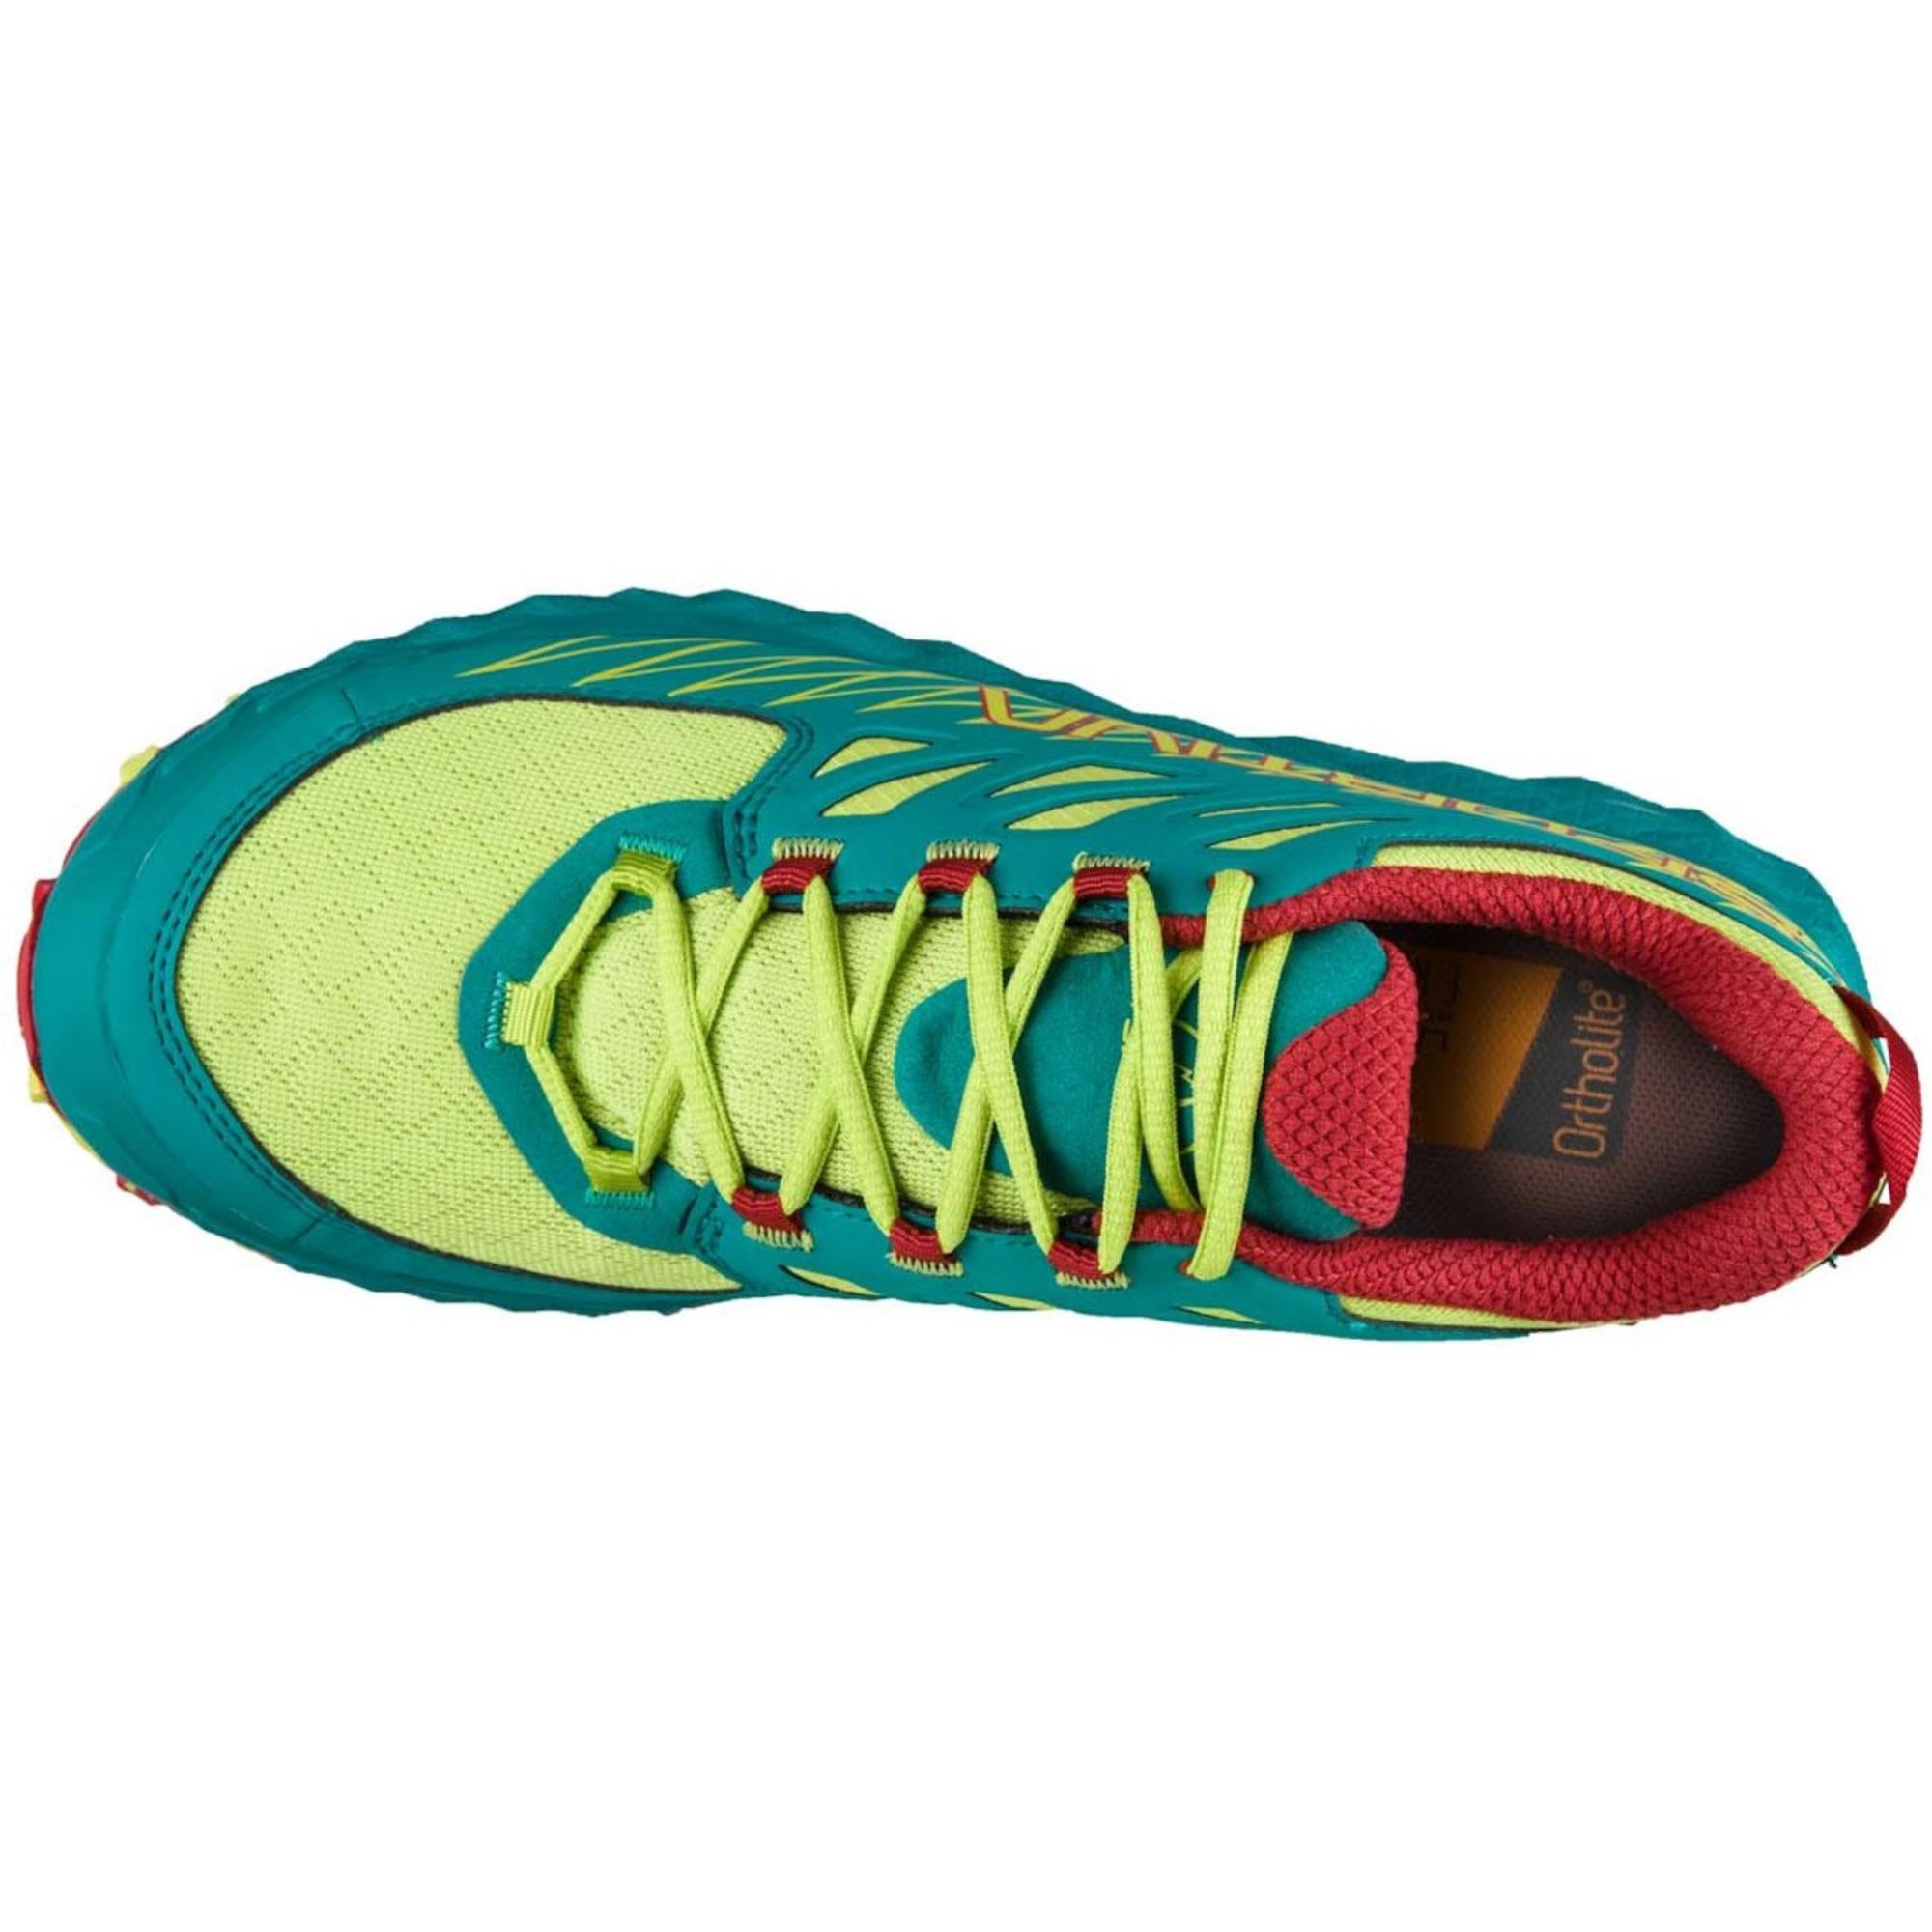 La Sportiva Lycan GTX Women's Trail Running Shoes - Apple Green/Emerald